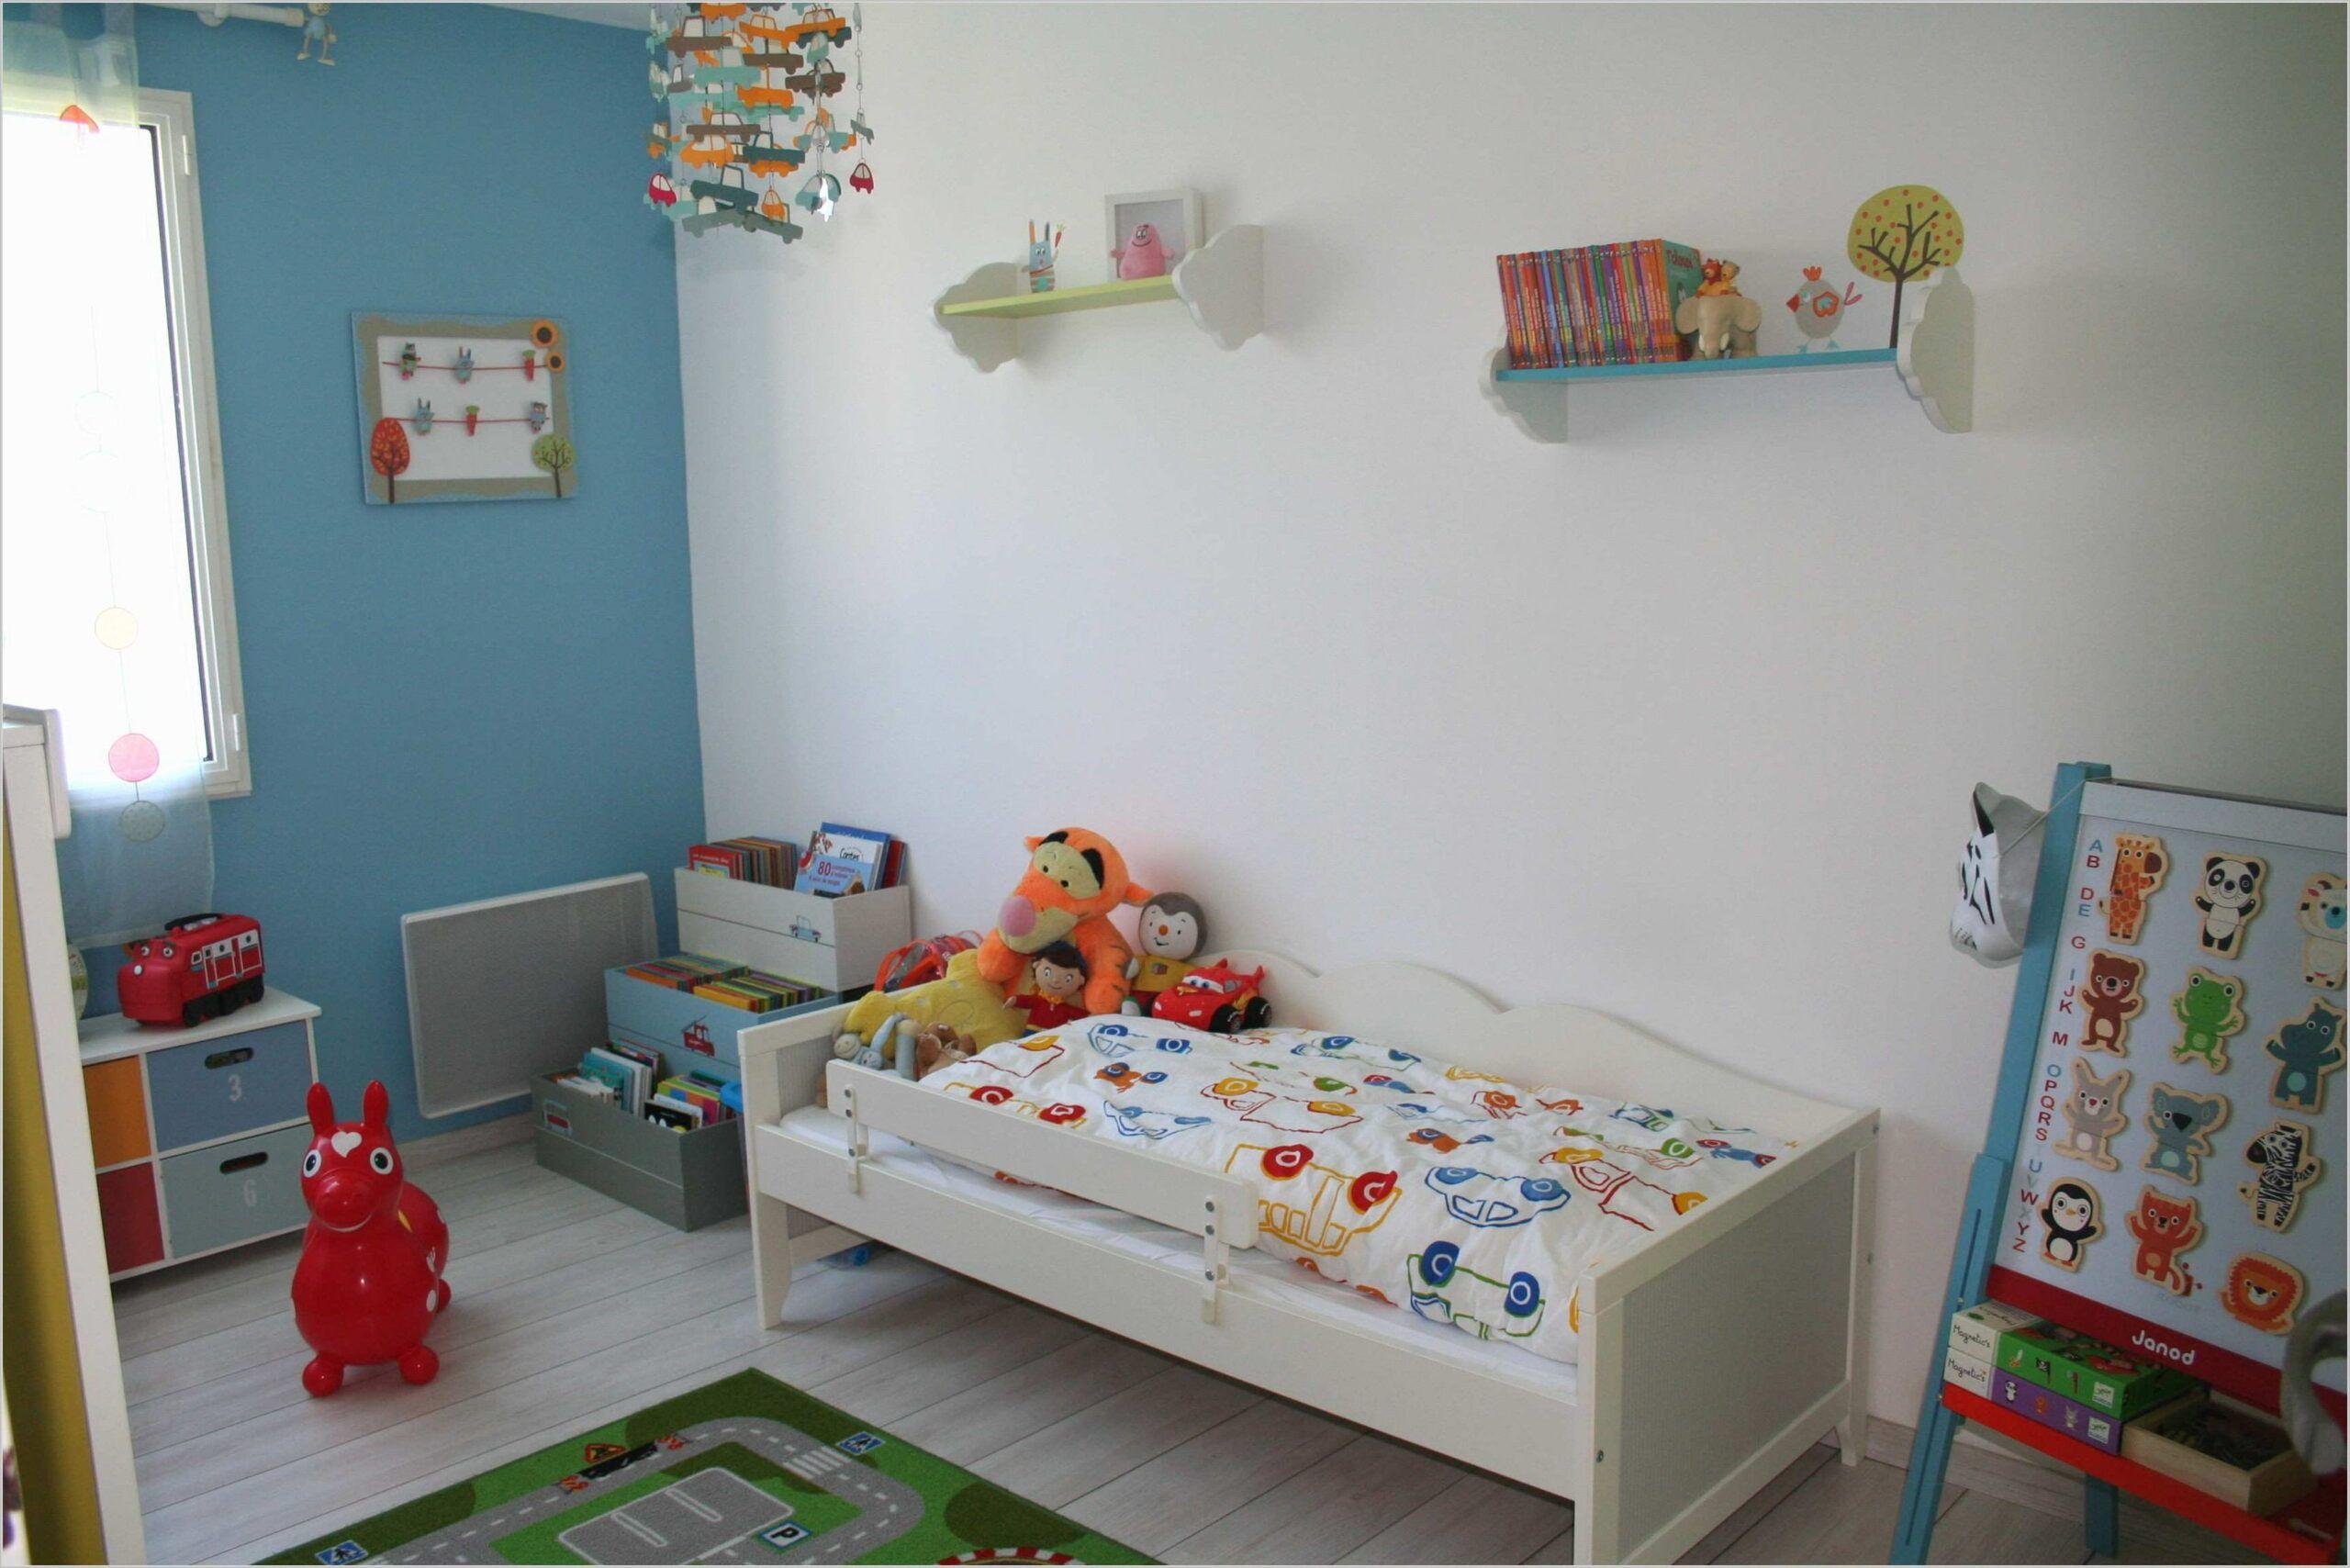 Chambre Enfant 3 Ans Idee Deco En 2020 Deco Chambre Garcon Idee